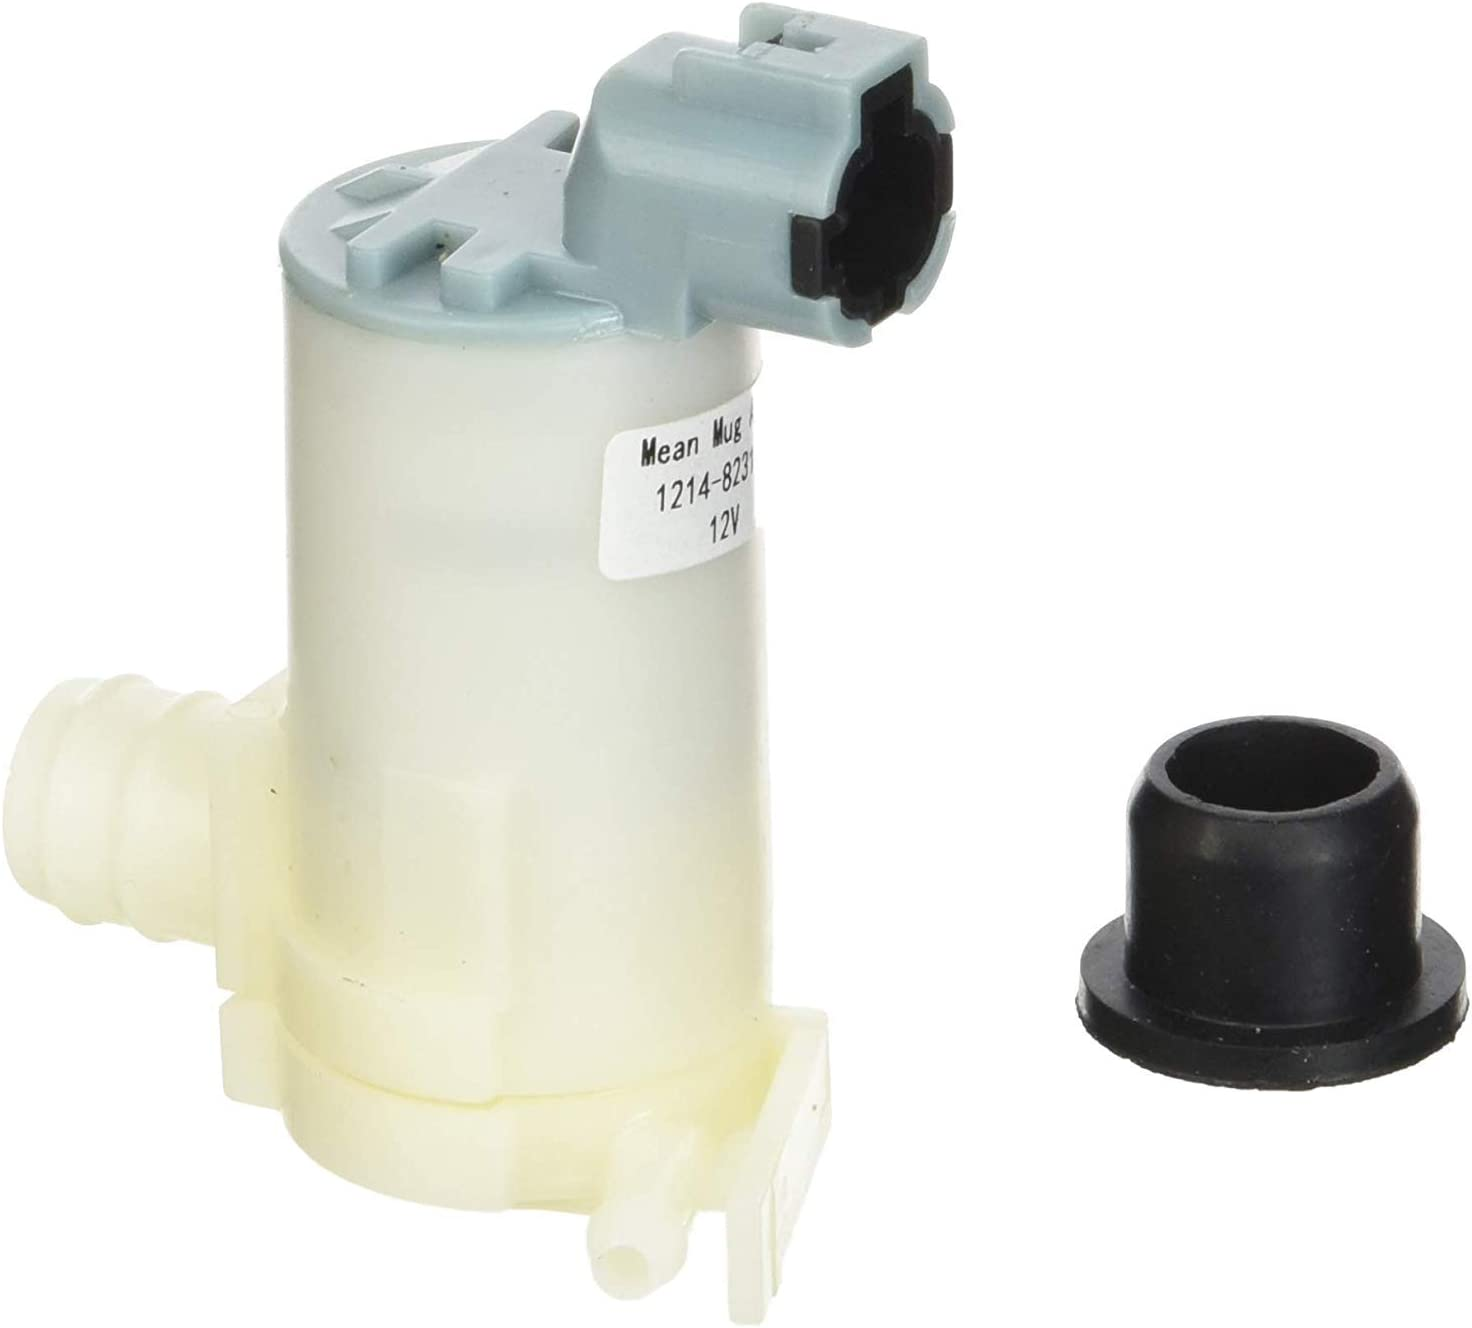 Infiniti G35 G37 M35 M45 Nissan 350Z 370Z GT-R Windshield Washer Pump with Grommet fits